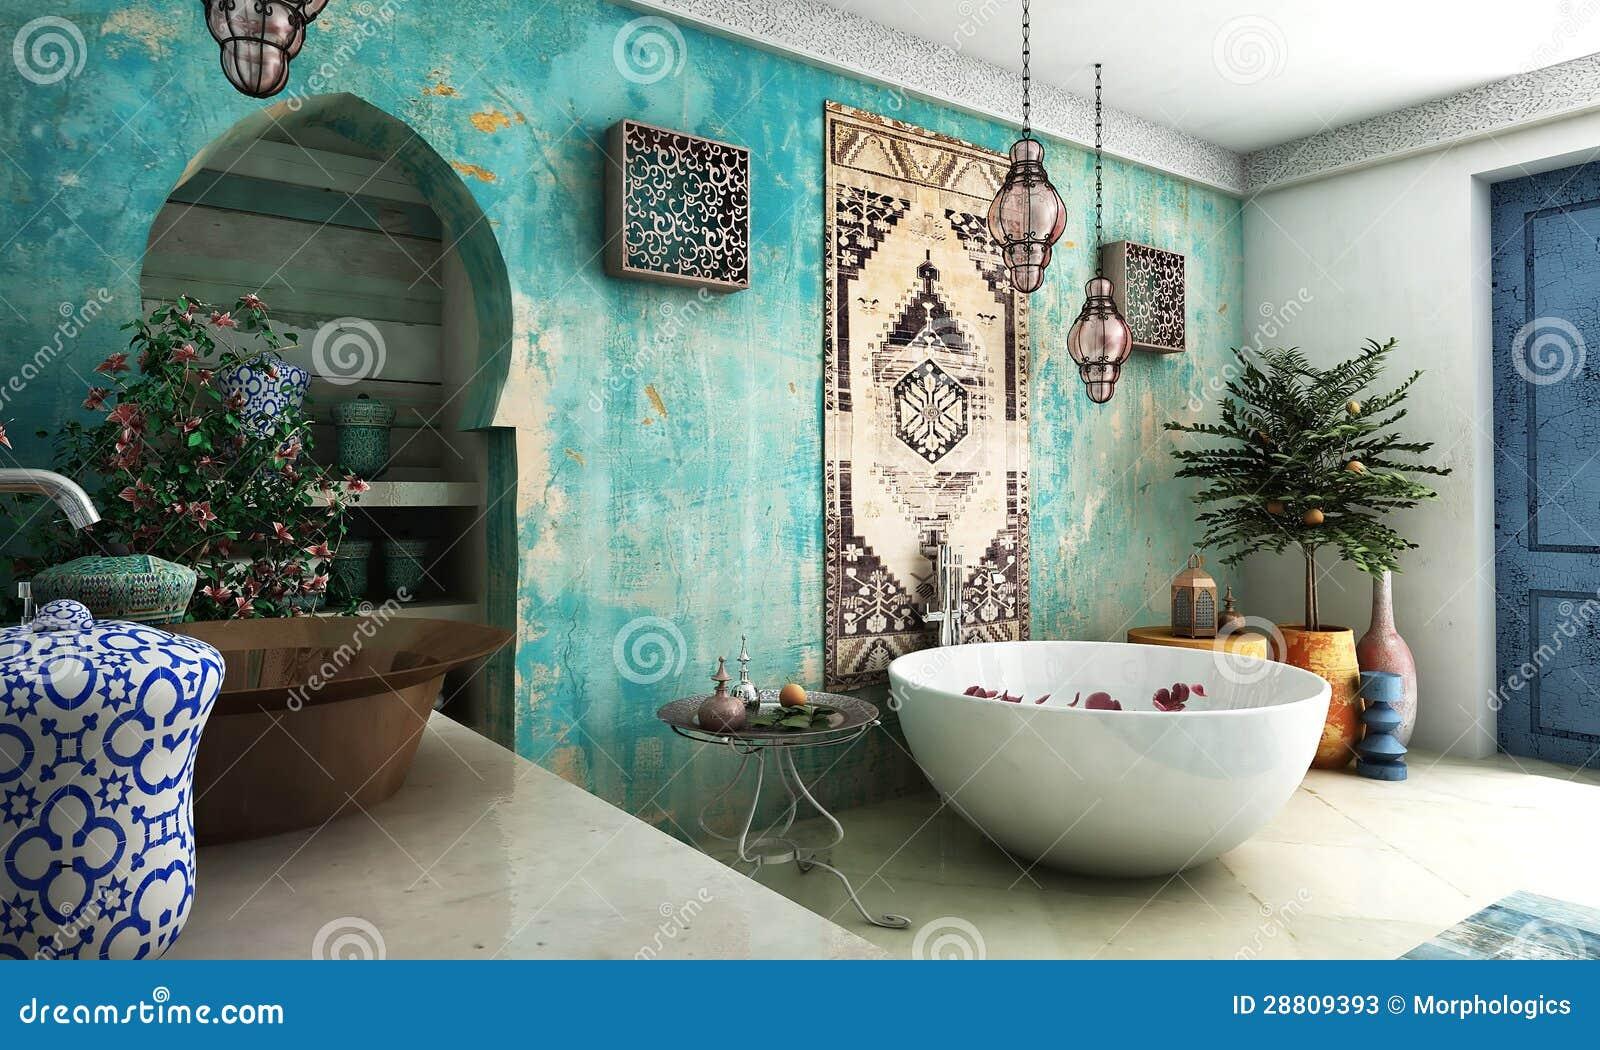 Marokkaanse badkamers stock foto 39 s afbeelding 28809393 - Badkamers ...